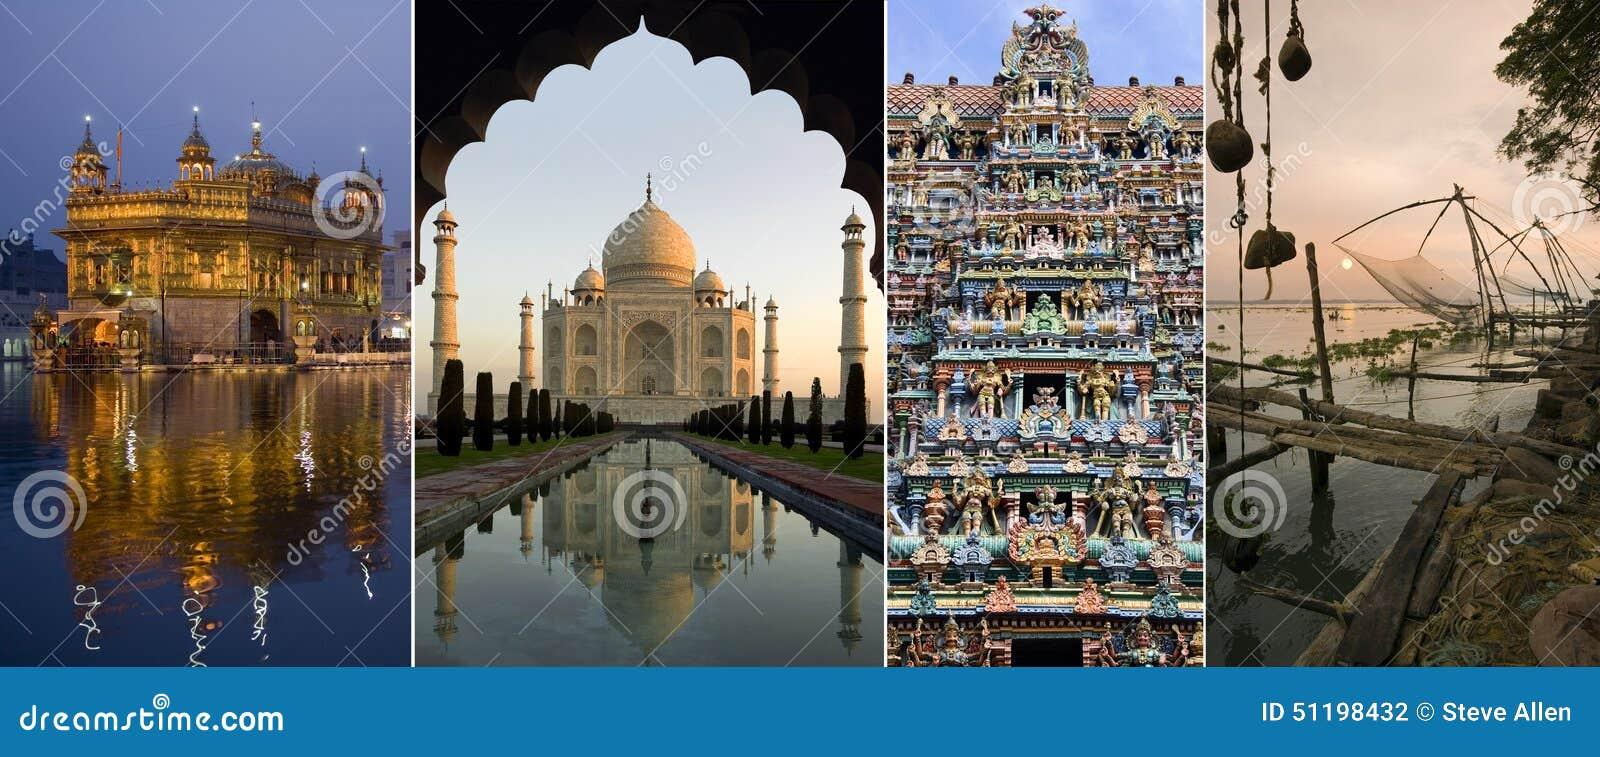 Sights of India